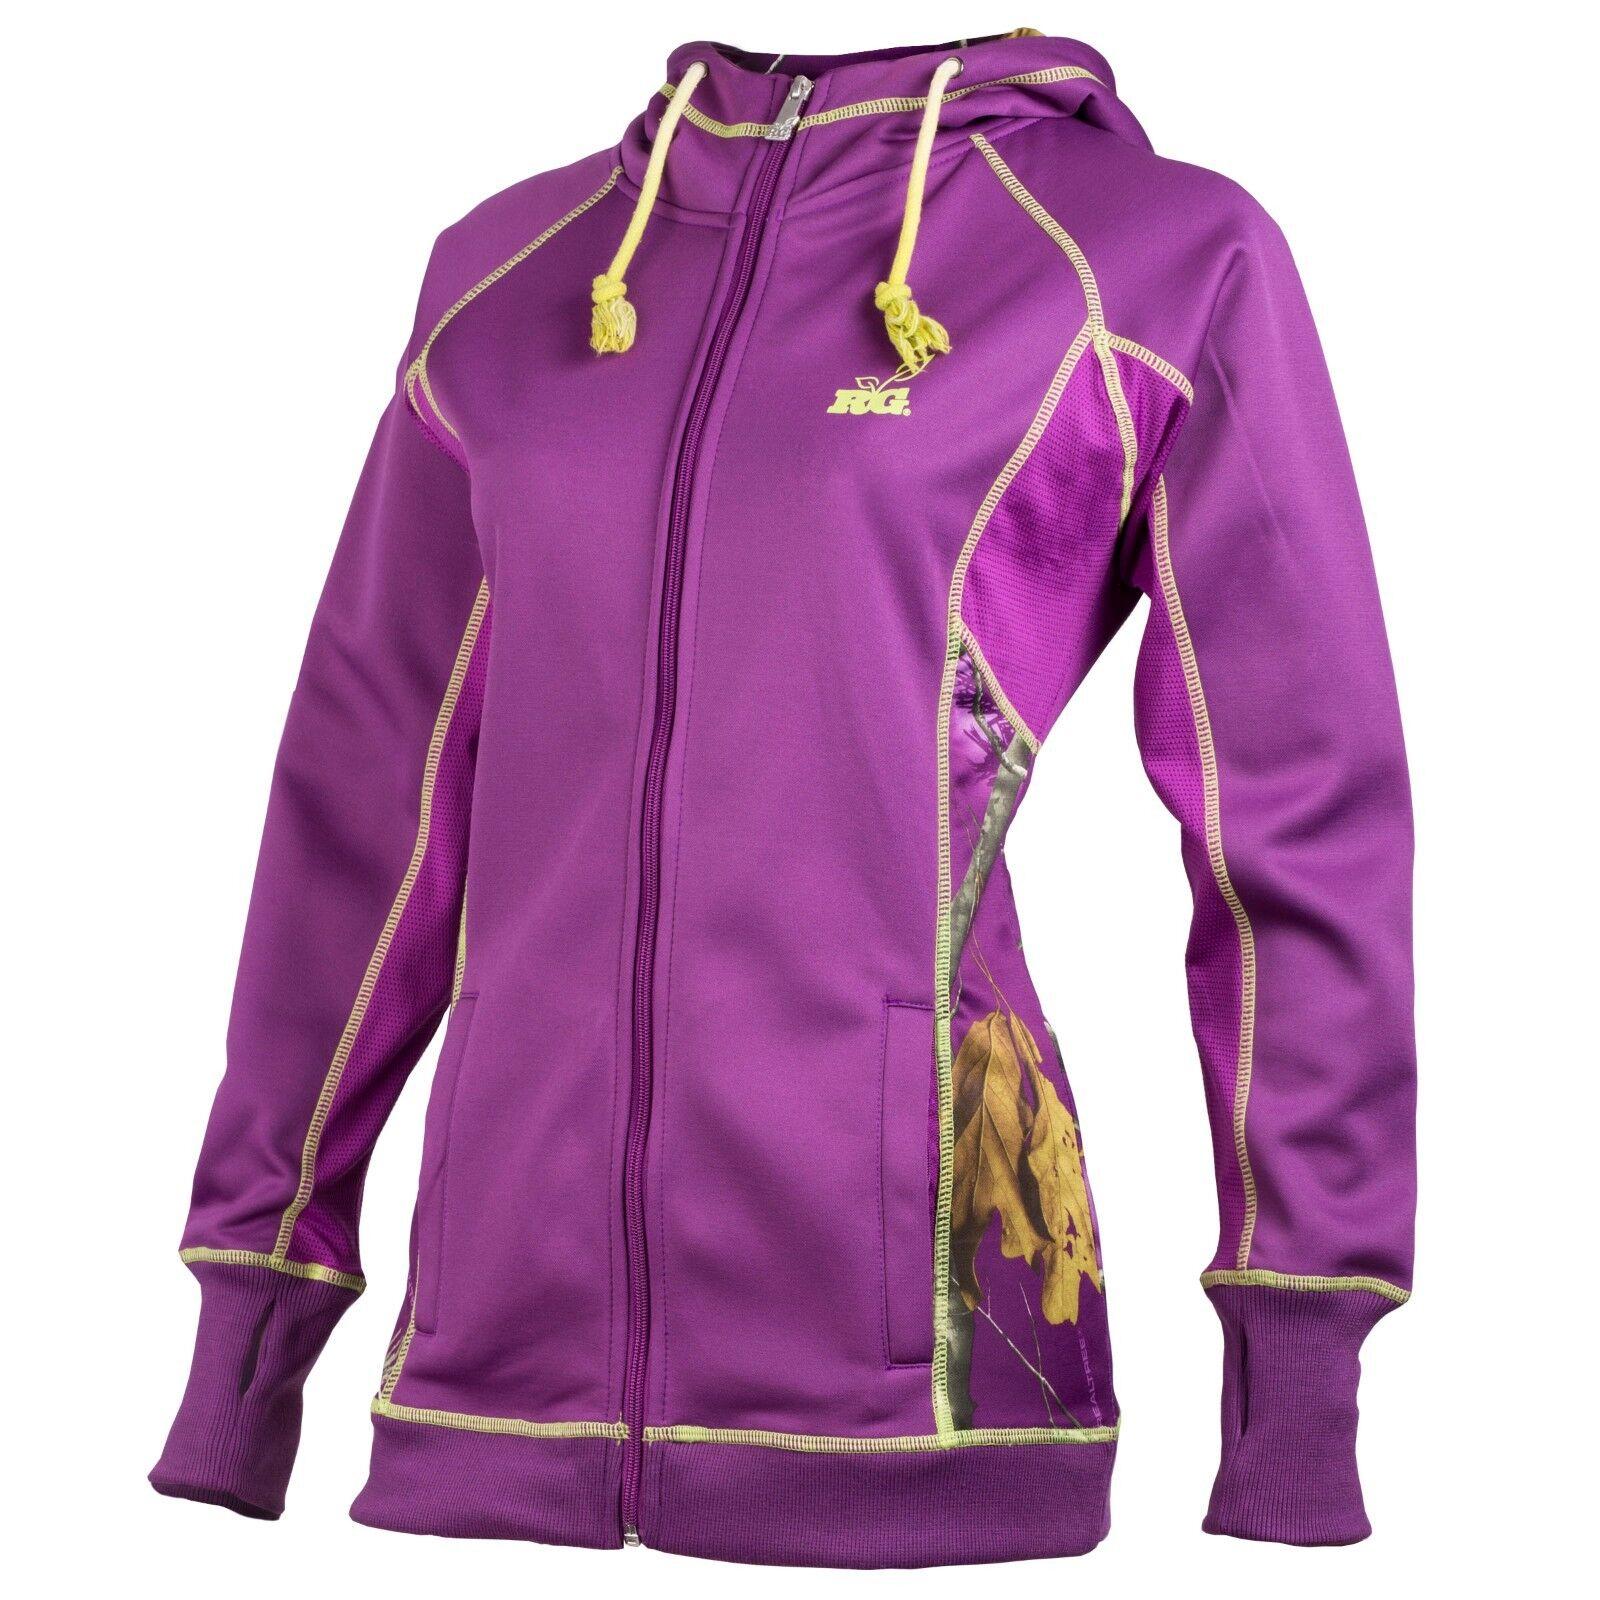 Realtree Girl RTG Women's Large Knox Hooded Sweatshirt Roman Purple RGI020016